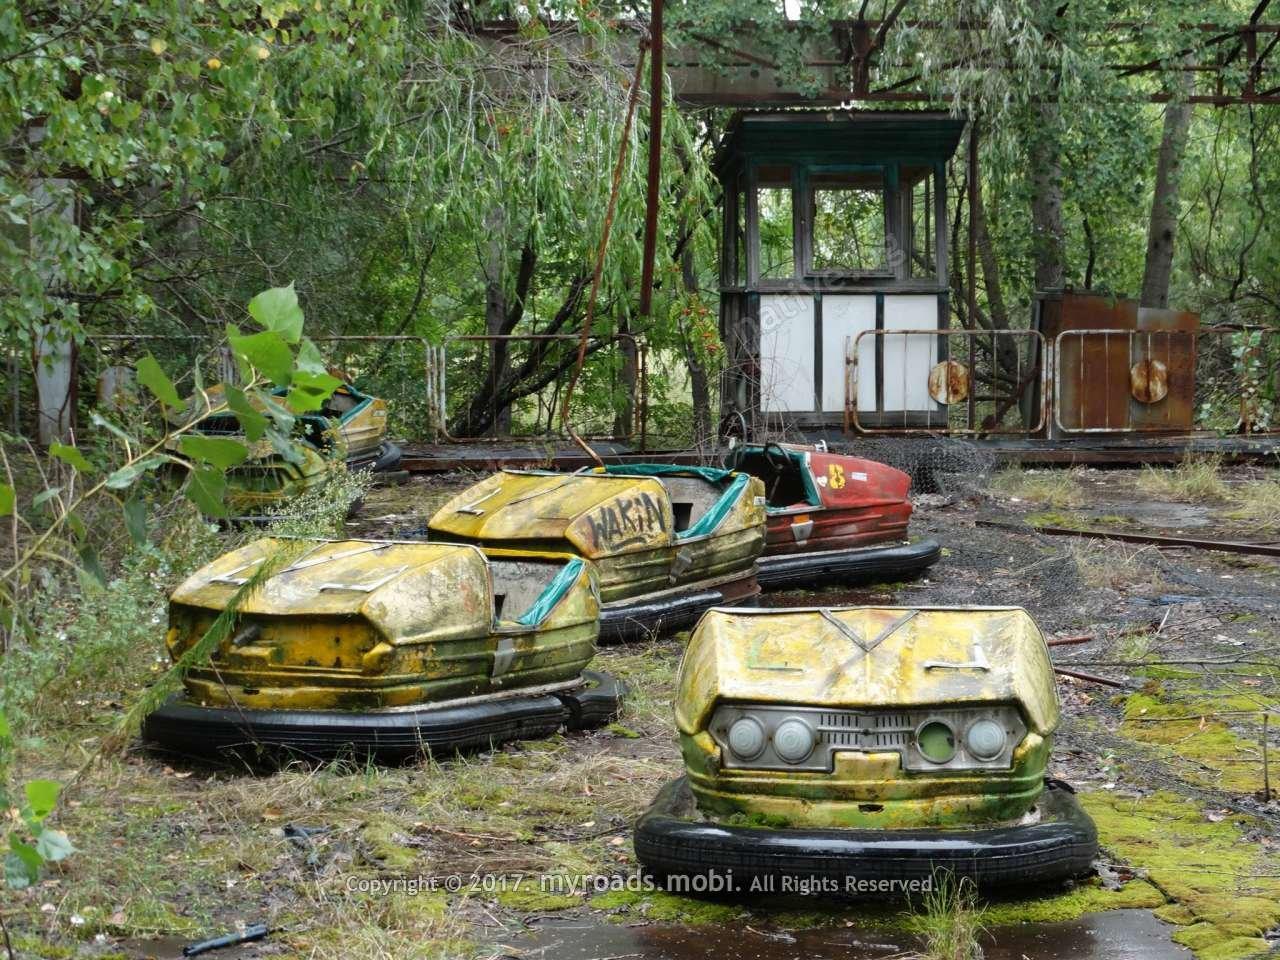 chernobil-pripyat-myroadsmobi-georgi-ivanov (8)